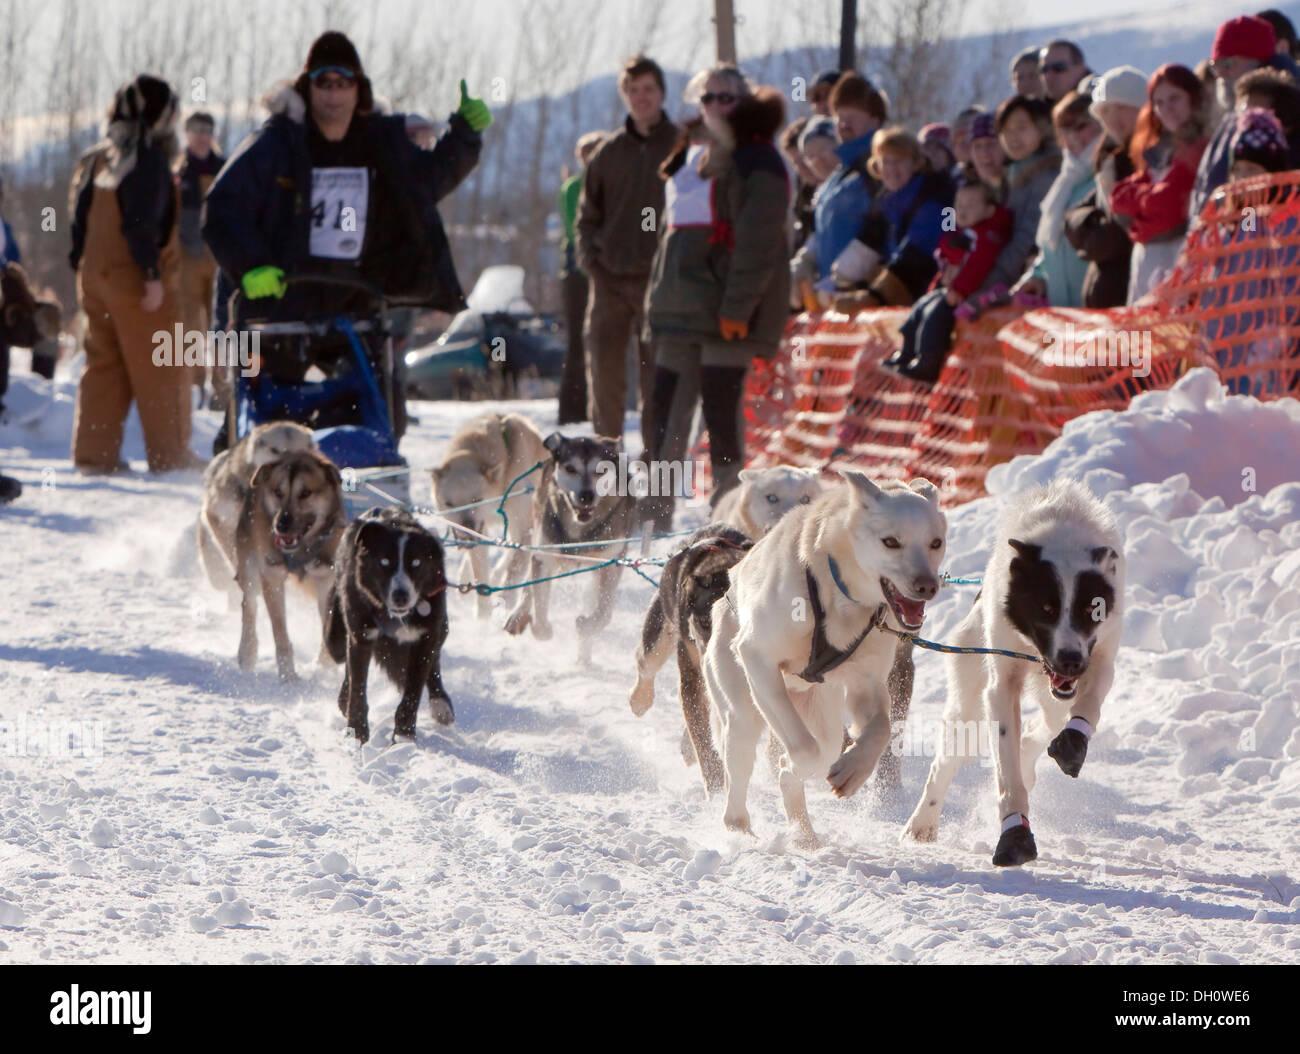 Yukon Quest and Iditarod musher Hugh Neff giving a thumbs up, dog sledding, mushing, running sled dogs, Alaskan Huskies, dog - Stock Image